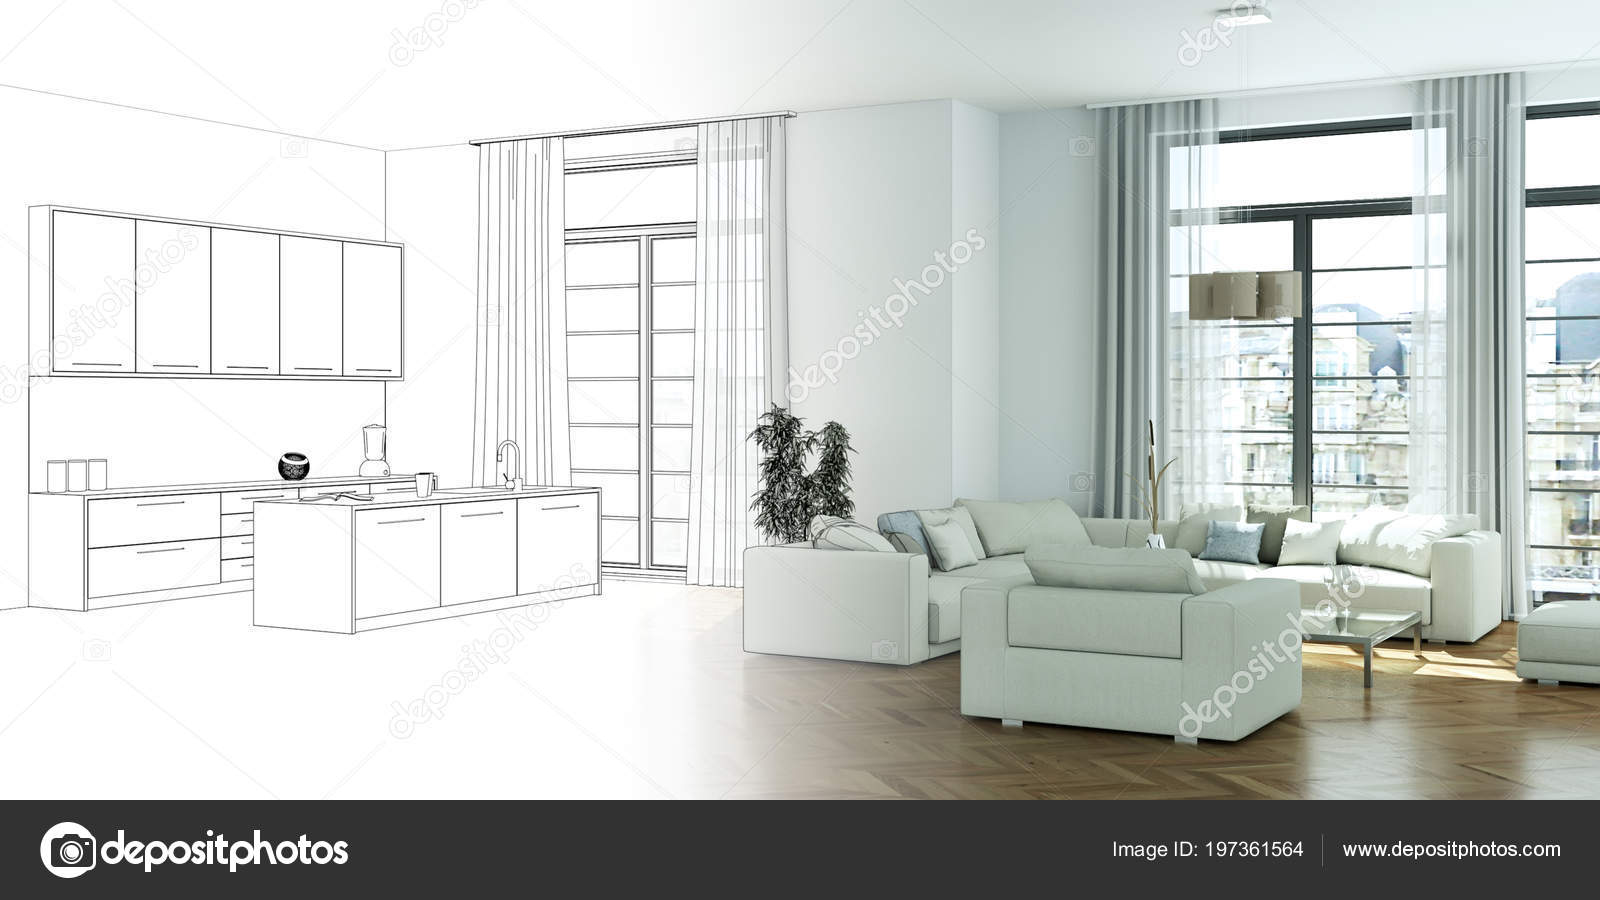 Interior Design Living Room Drawing Gradation Into Photograph Stock Photo